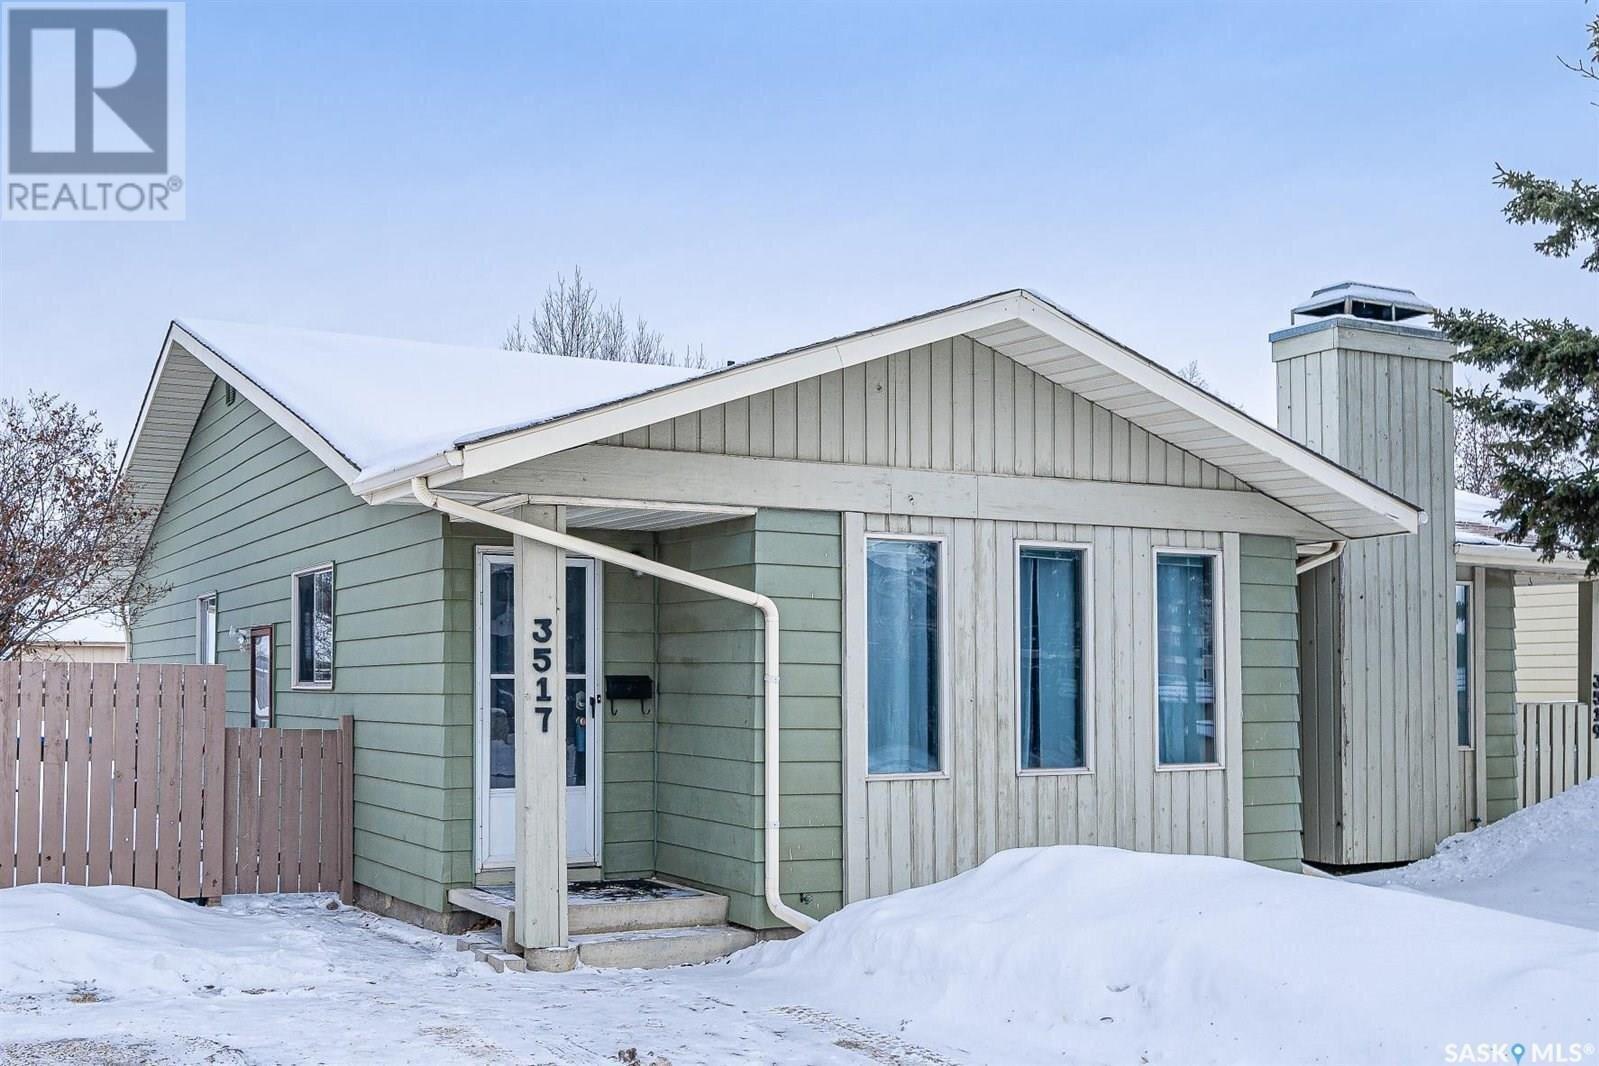 House for sale at 3517 Taylor St E Saskatoon Saskatchewan - MLS: SK839523